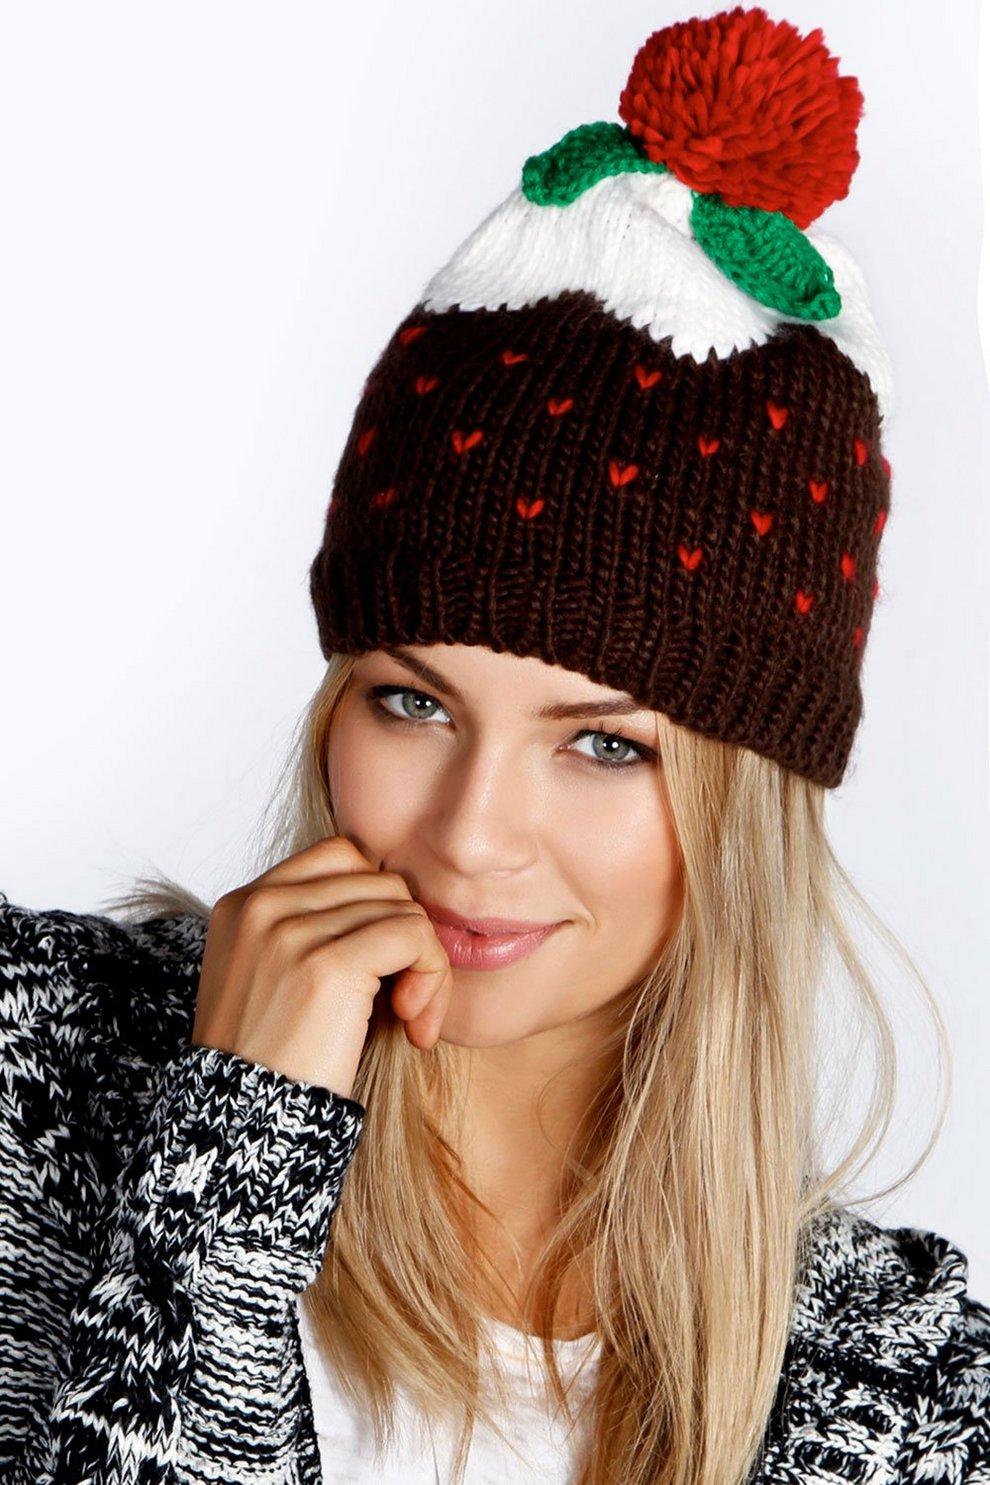 ce5cd34e9a264 Holly Christmas Pudding Beanie Hat | Boohoo